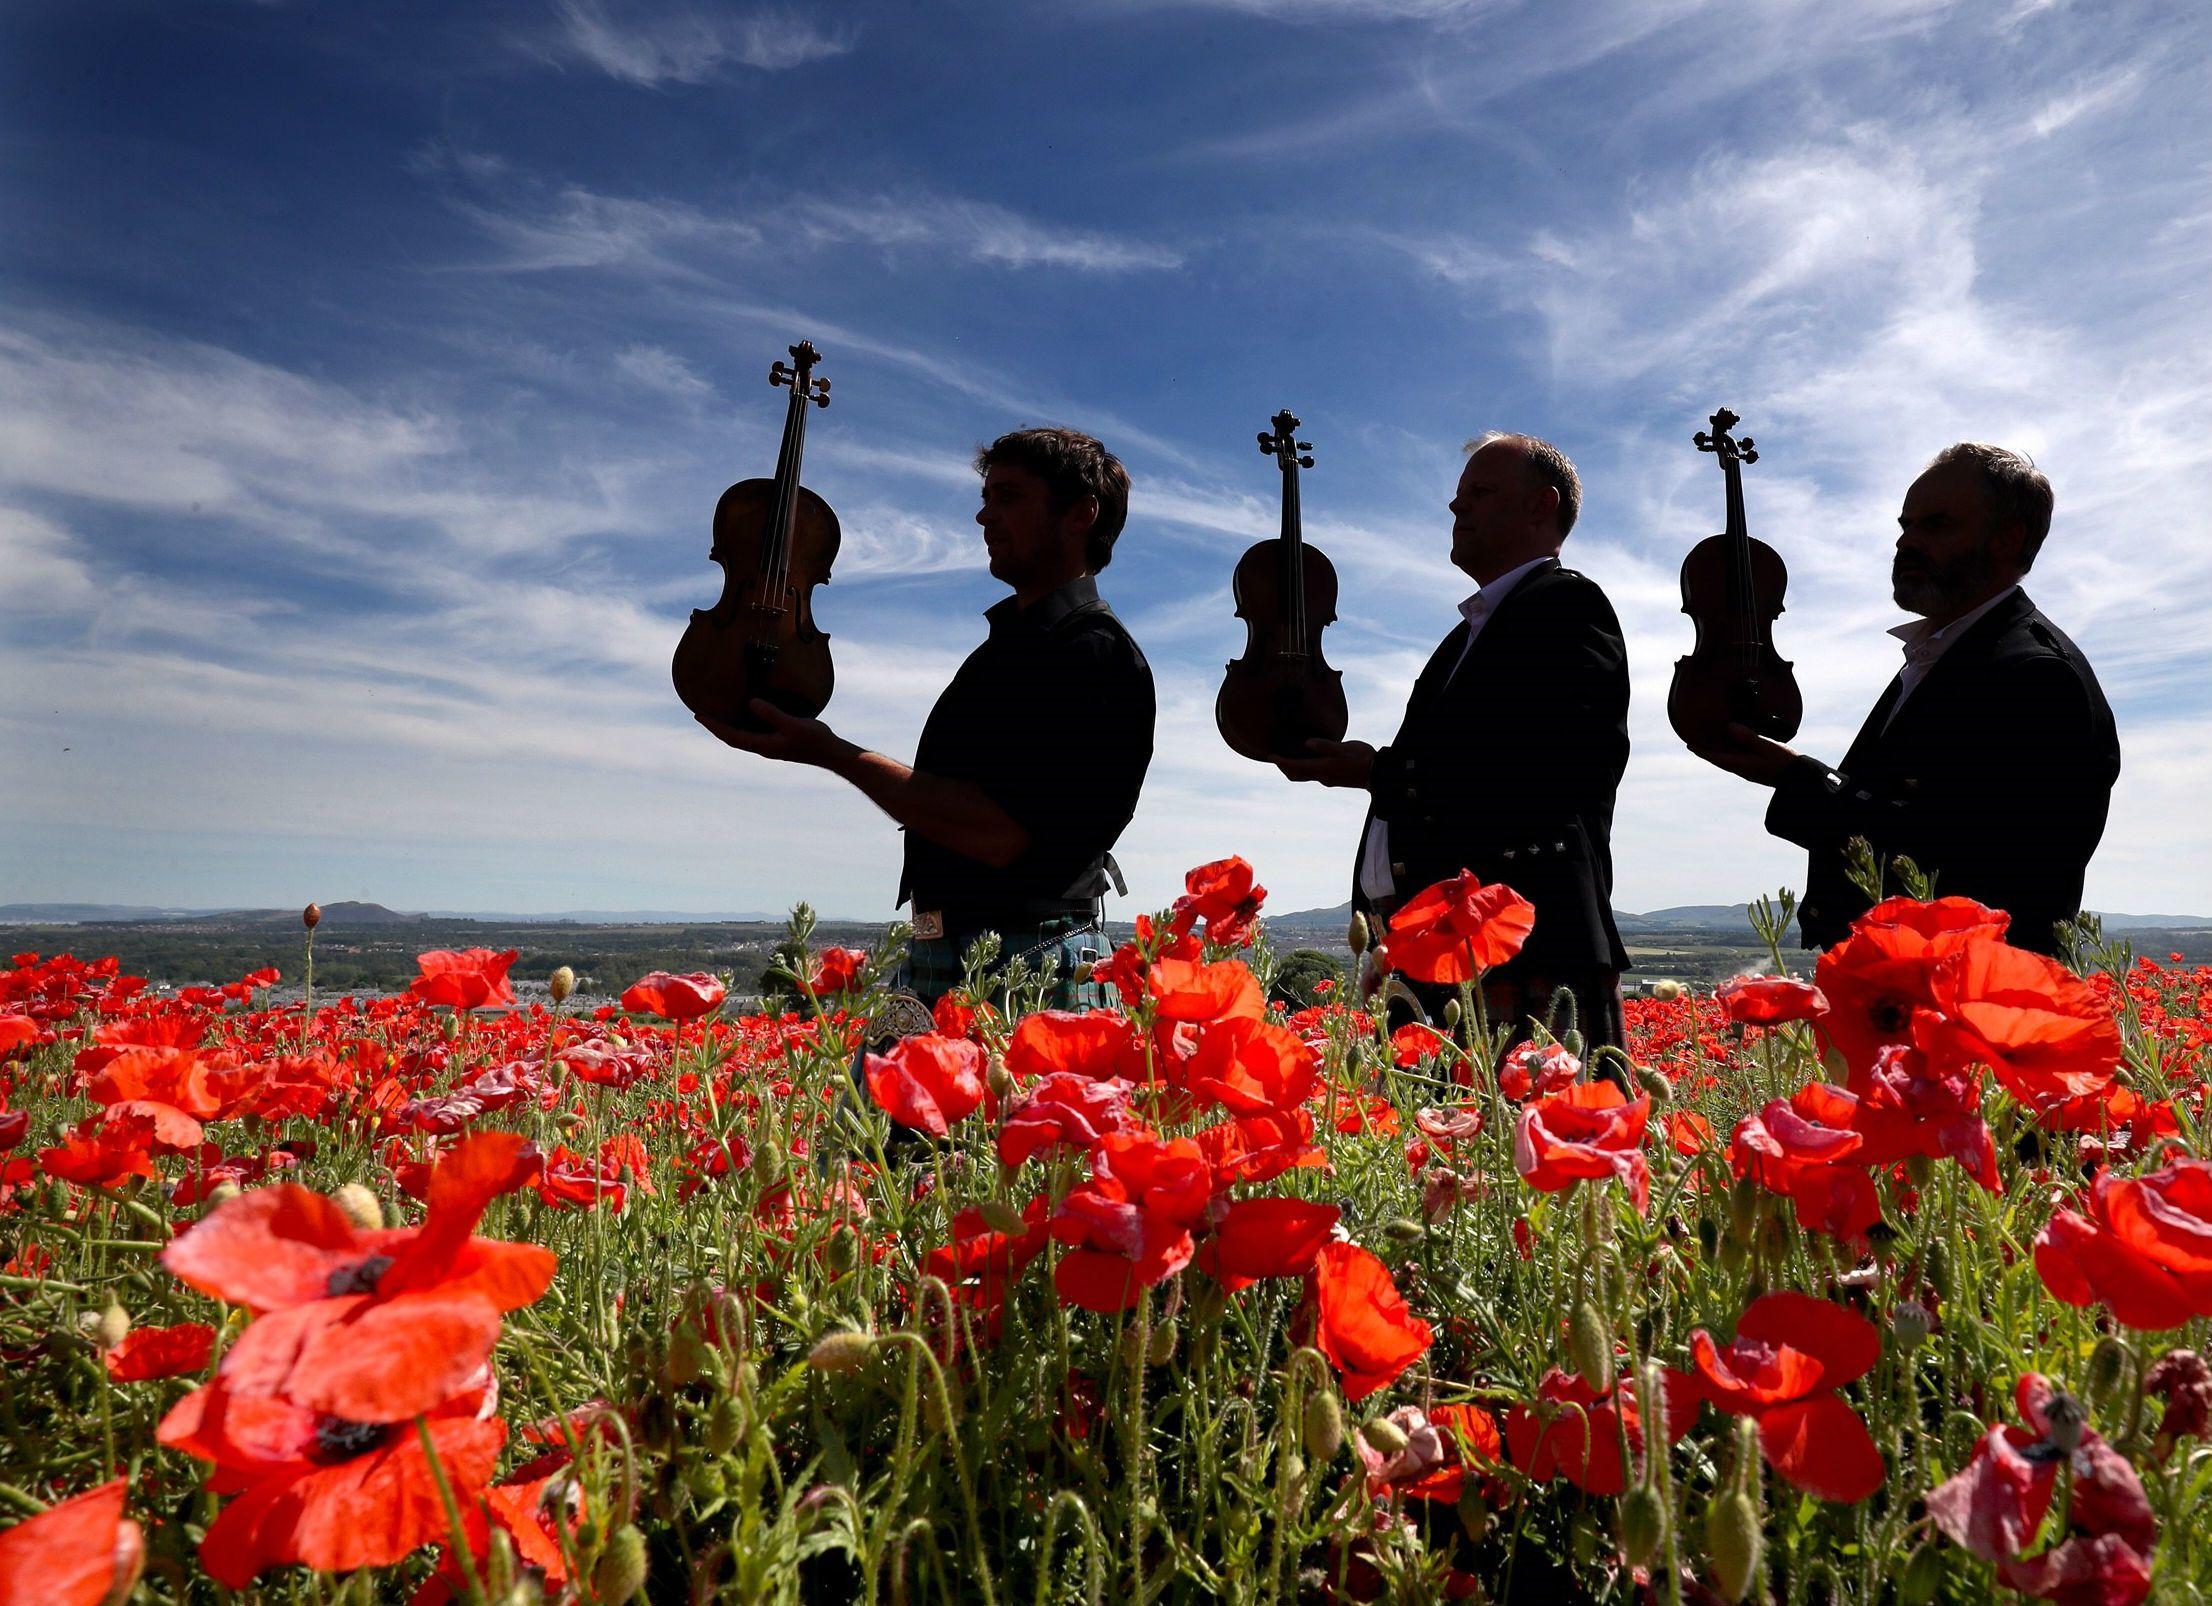 Three musicians in a poppy field